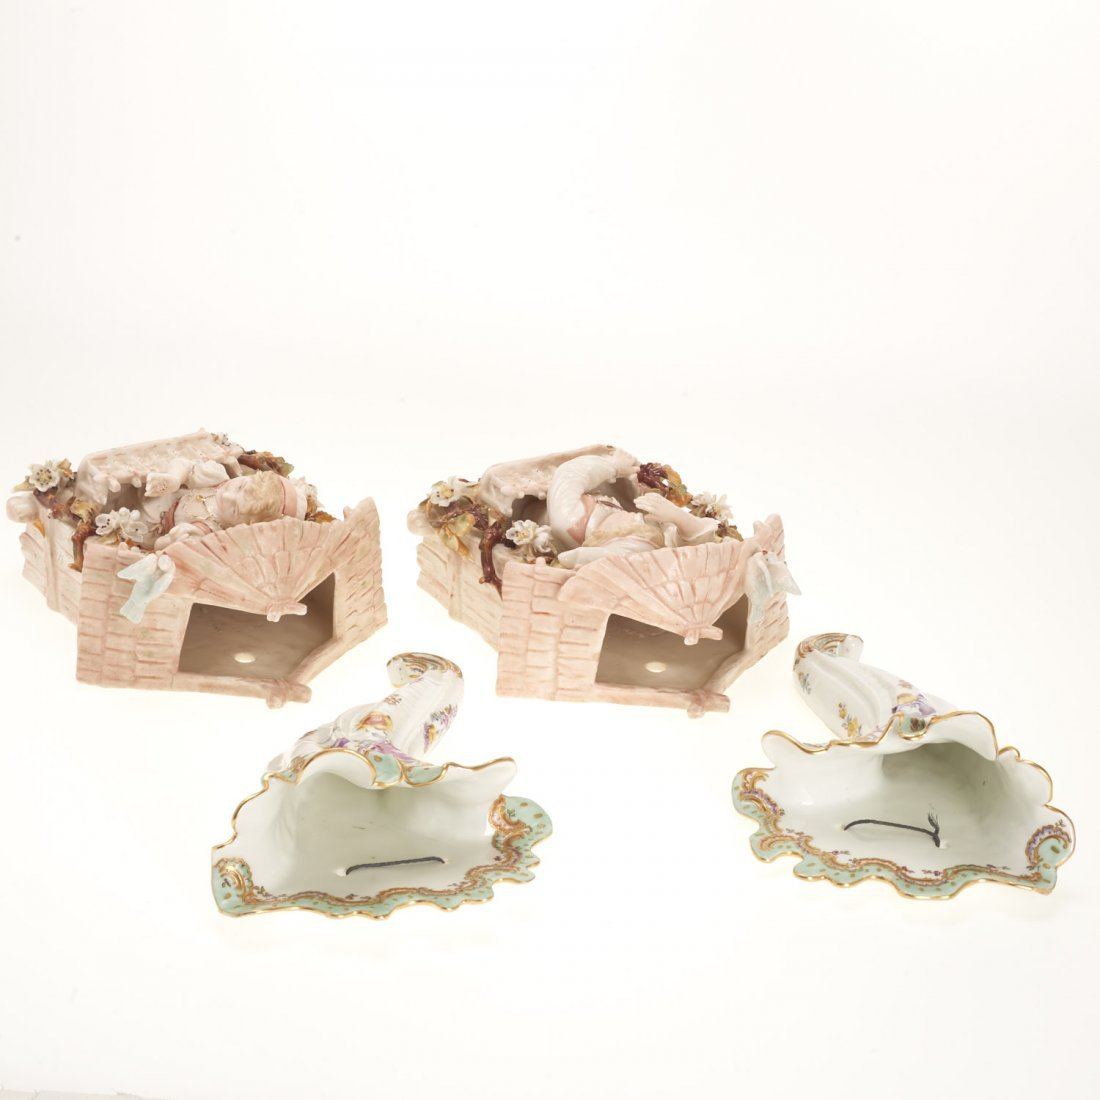 (2) Pr Antique Continental porcelain wall pockets - 7